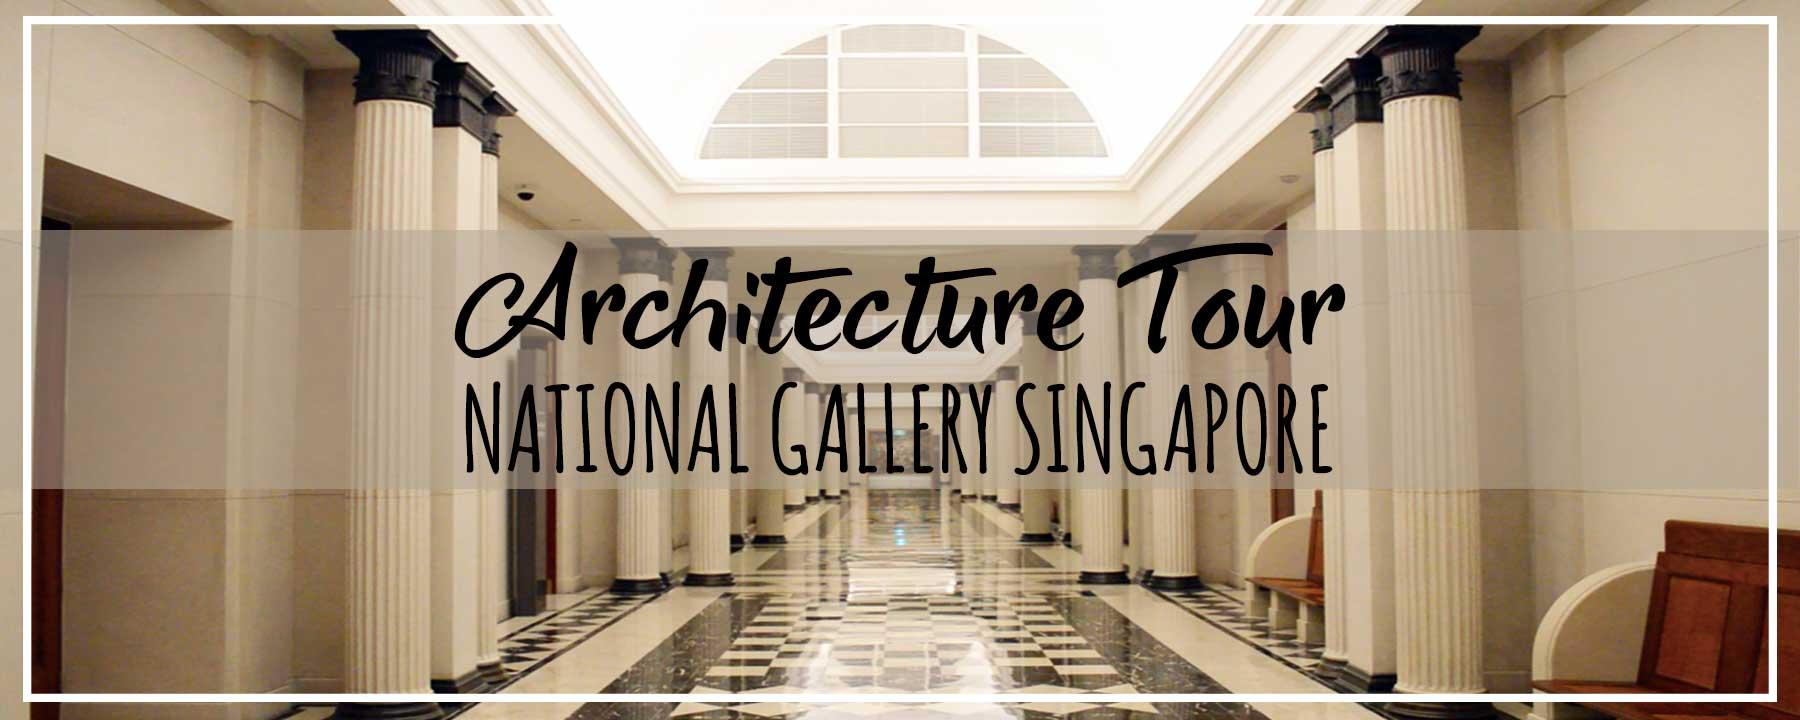 1 Min Tour | National Gallery Singapore's Architecture & Interior Design